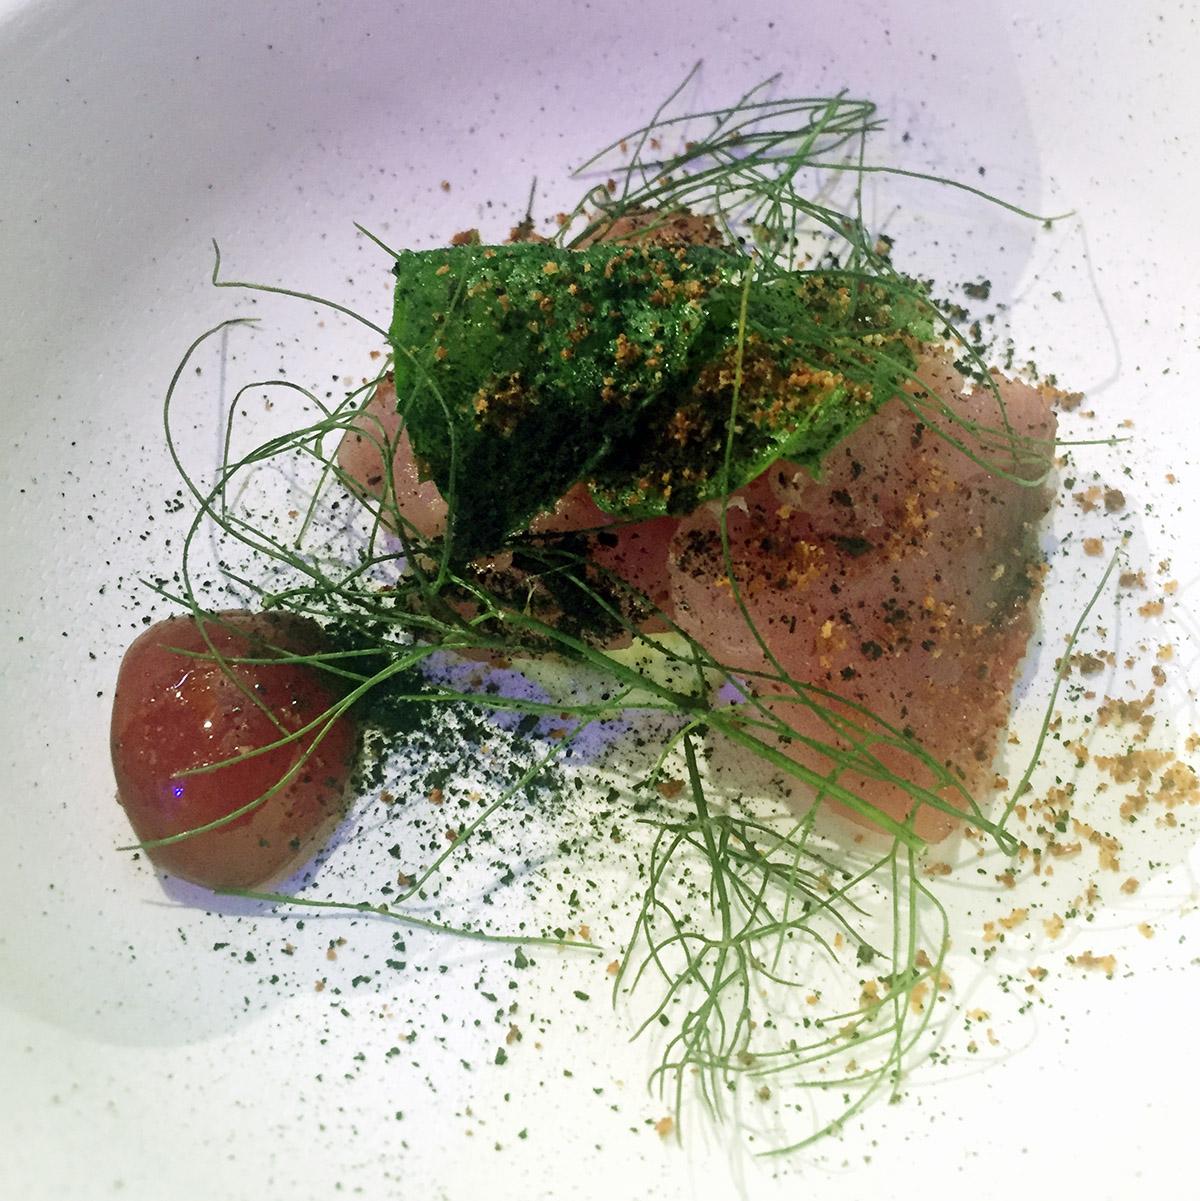 Simone Tondo - Tonno bianco, ciliegie, salicornia, salvia bruciata